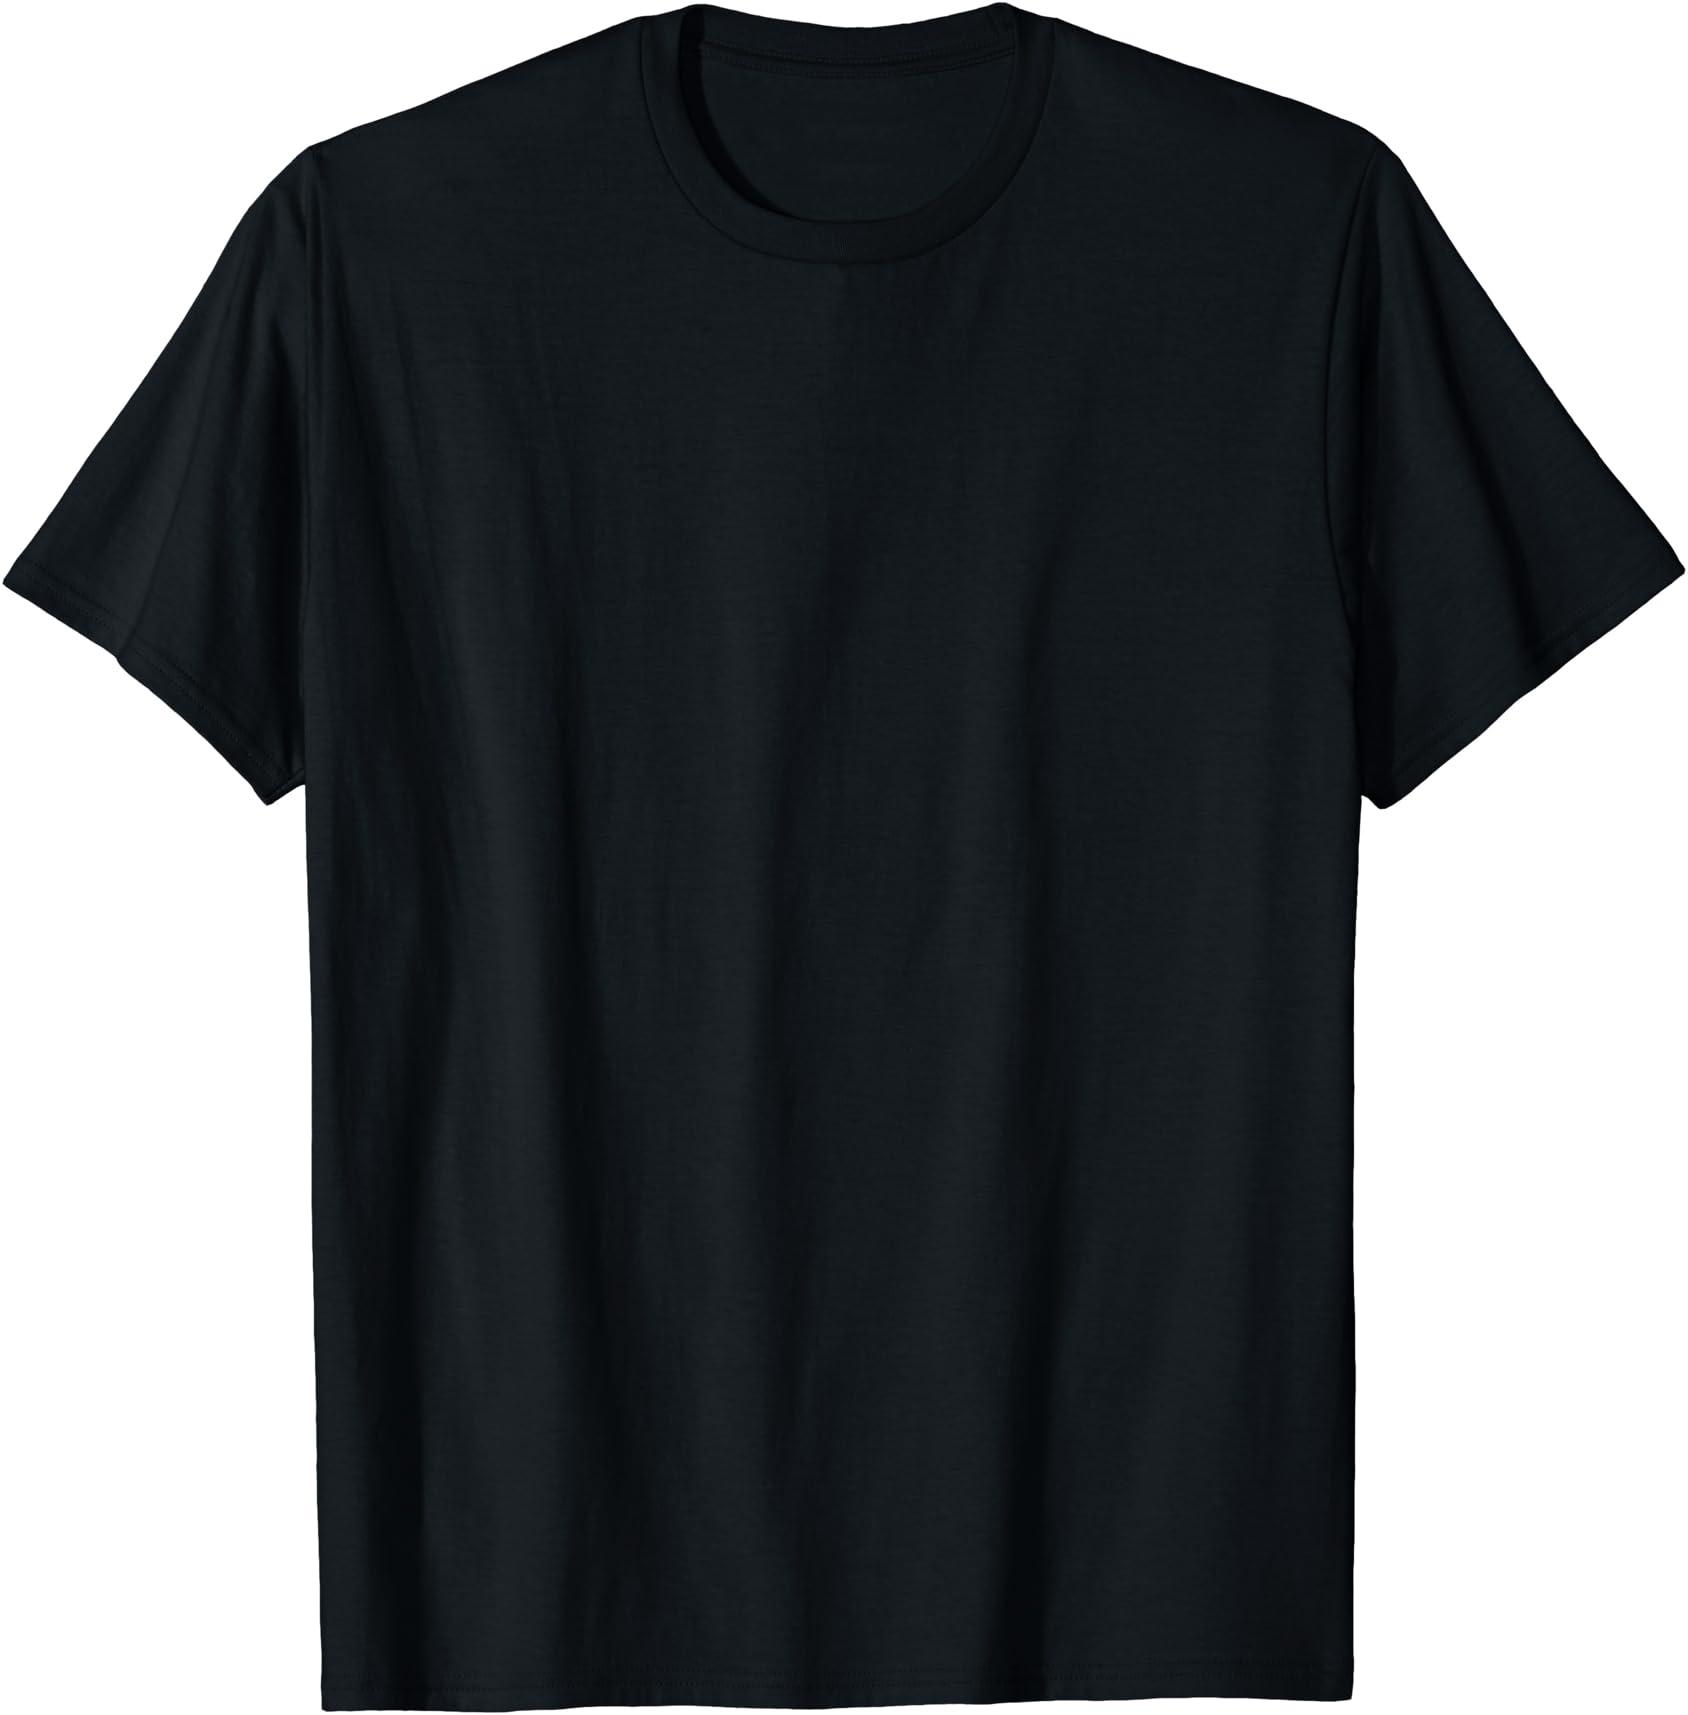 Kid/'s Grandad/'s Little Princess T-Shirt Family t-shirt Brand New